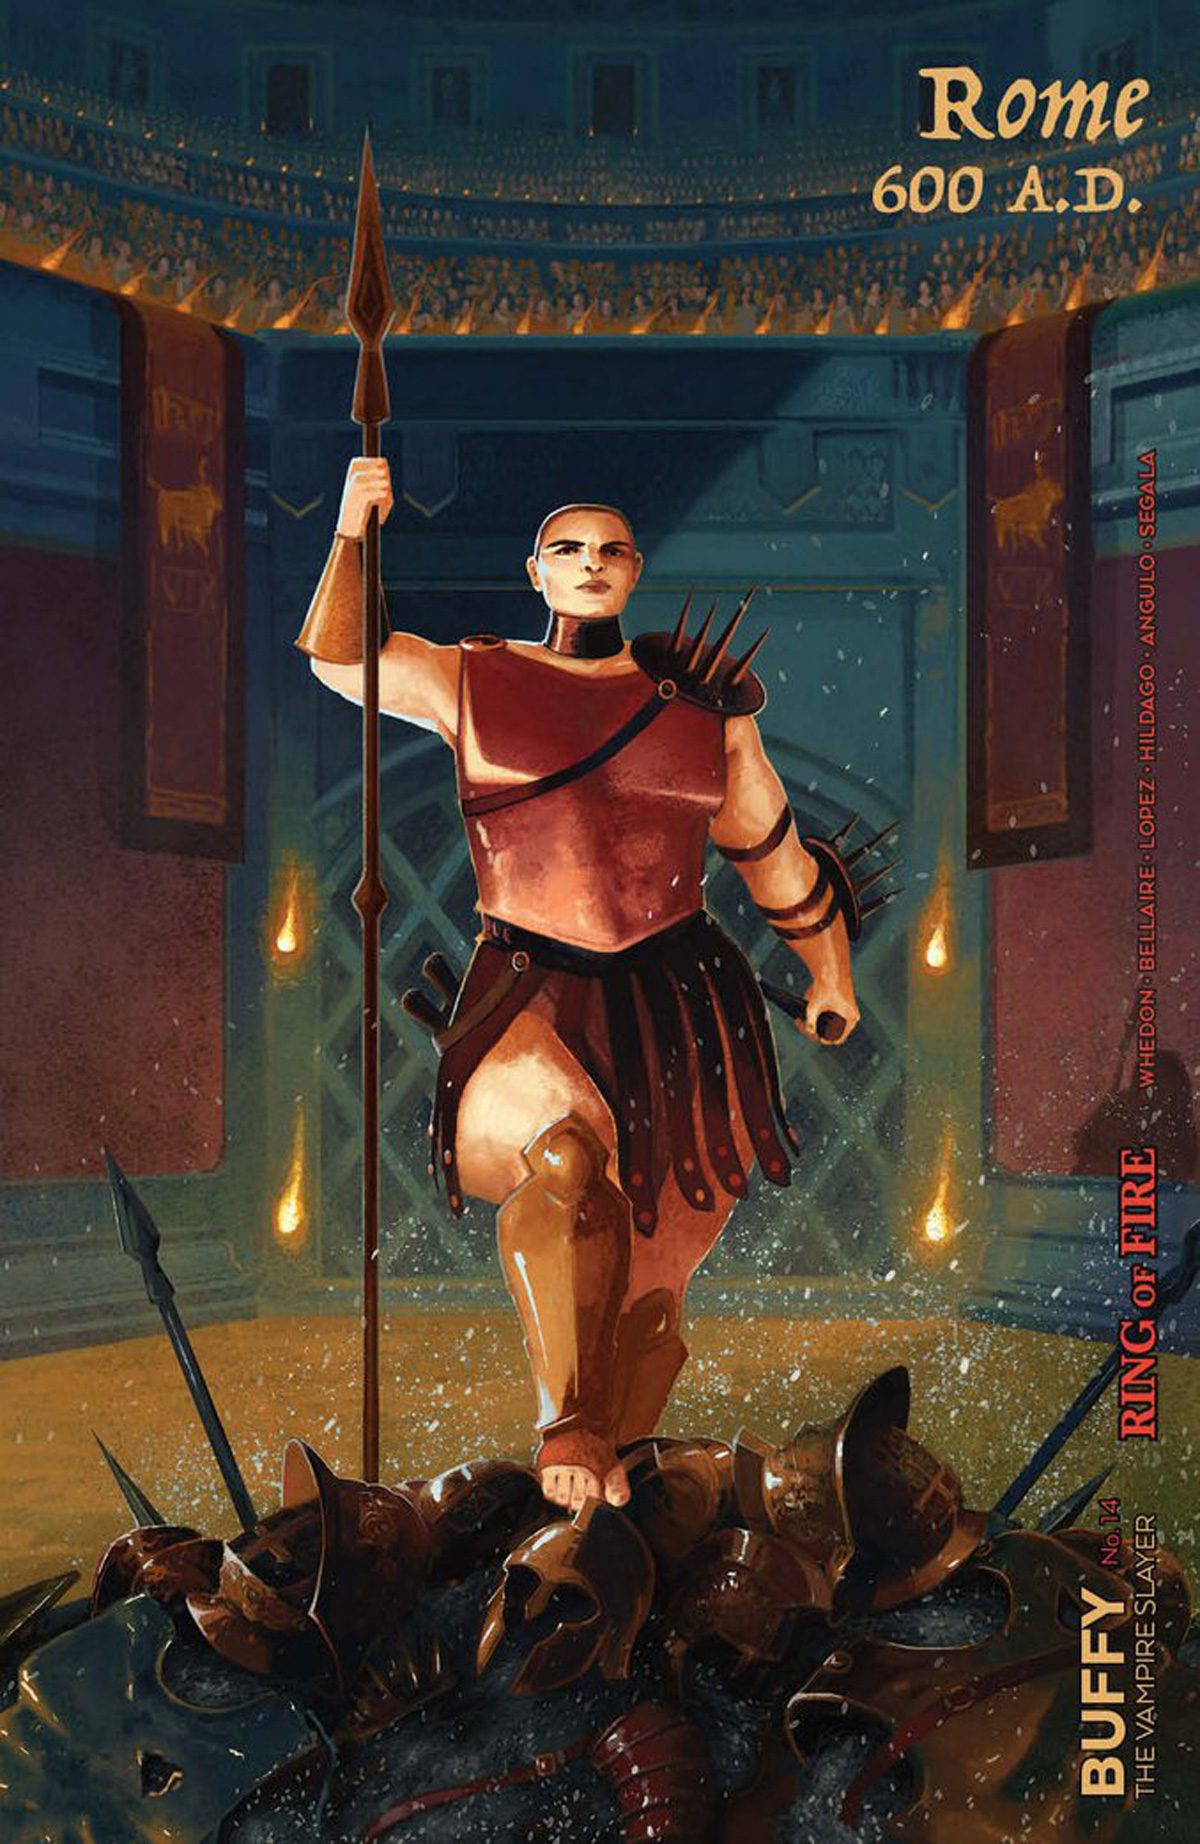 Buffy The Vampire Slayer Vol 2 #14 Cover D Variant Serena Malyon Slayer Cover